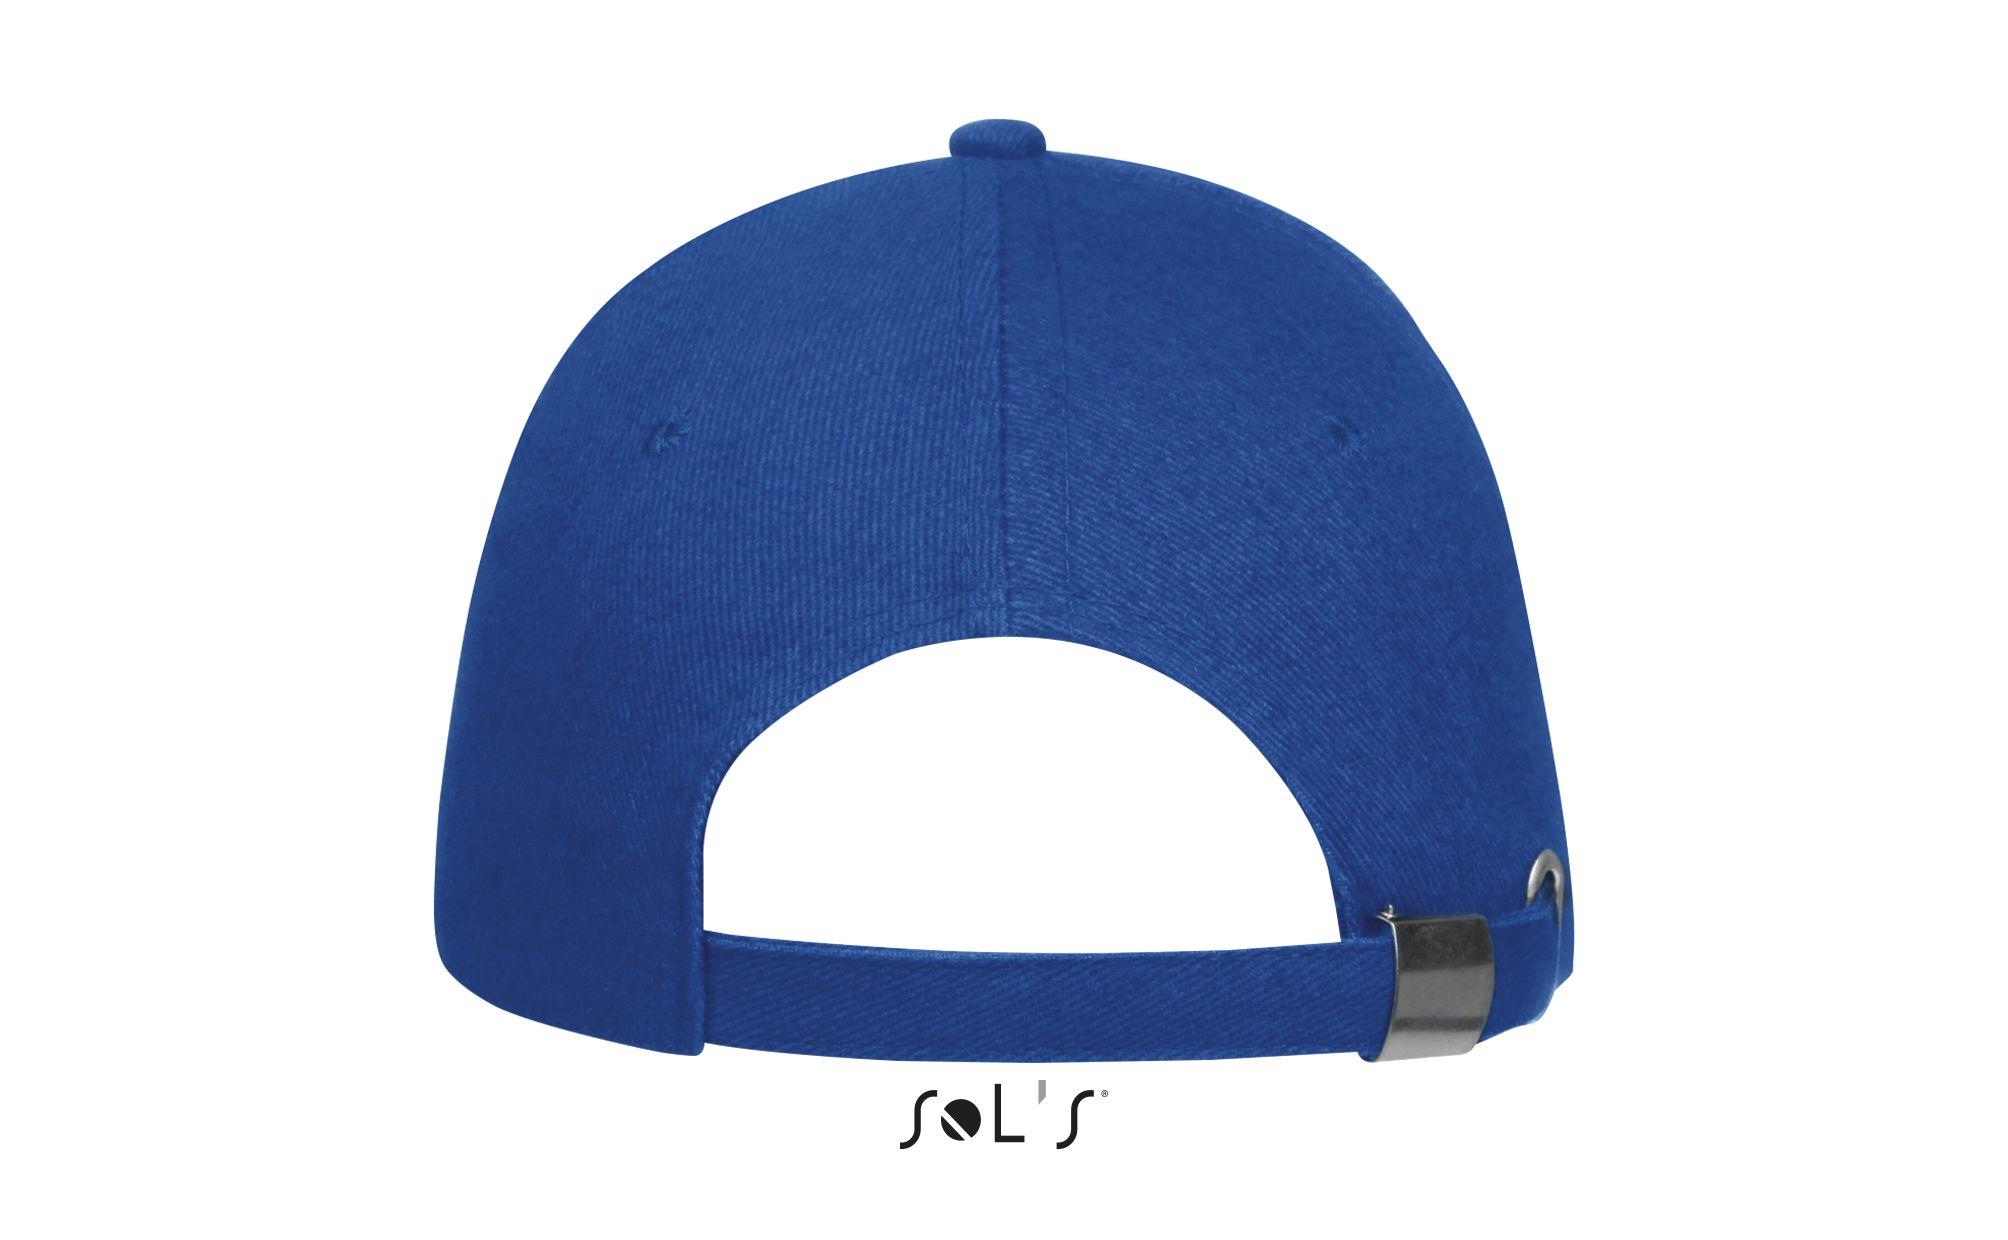 241 - Royal blue